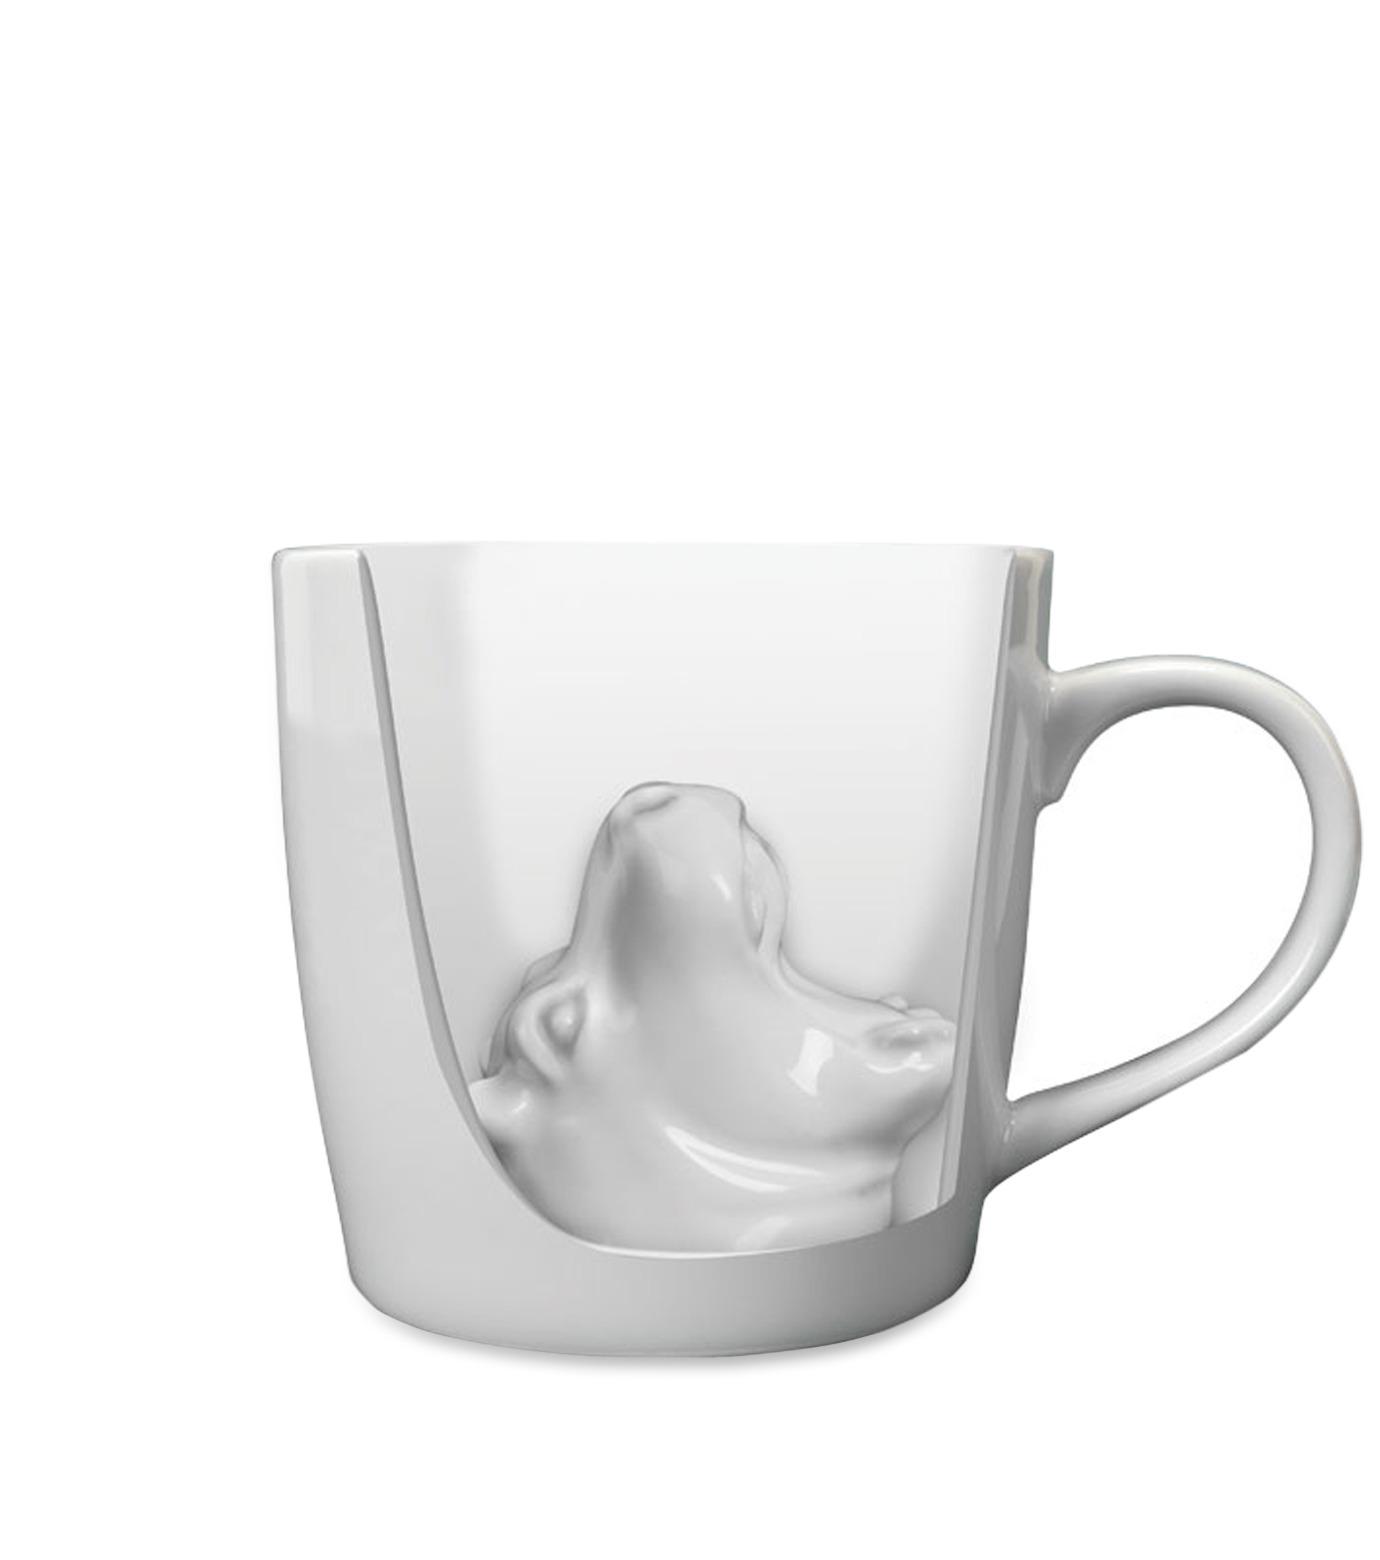 Accoutrements(アクータメンツ)のHippo Attack Porcelain Mug-WHITE-12339-4 拡大詳細画像2